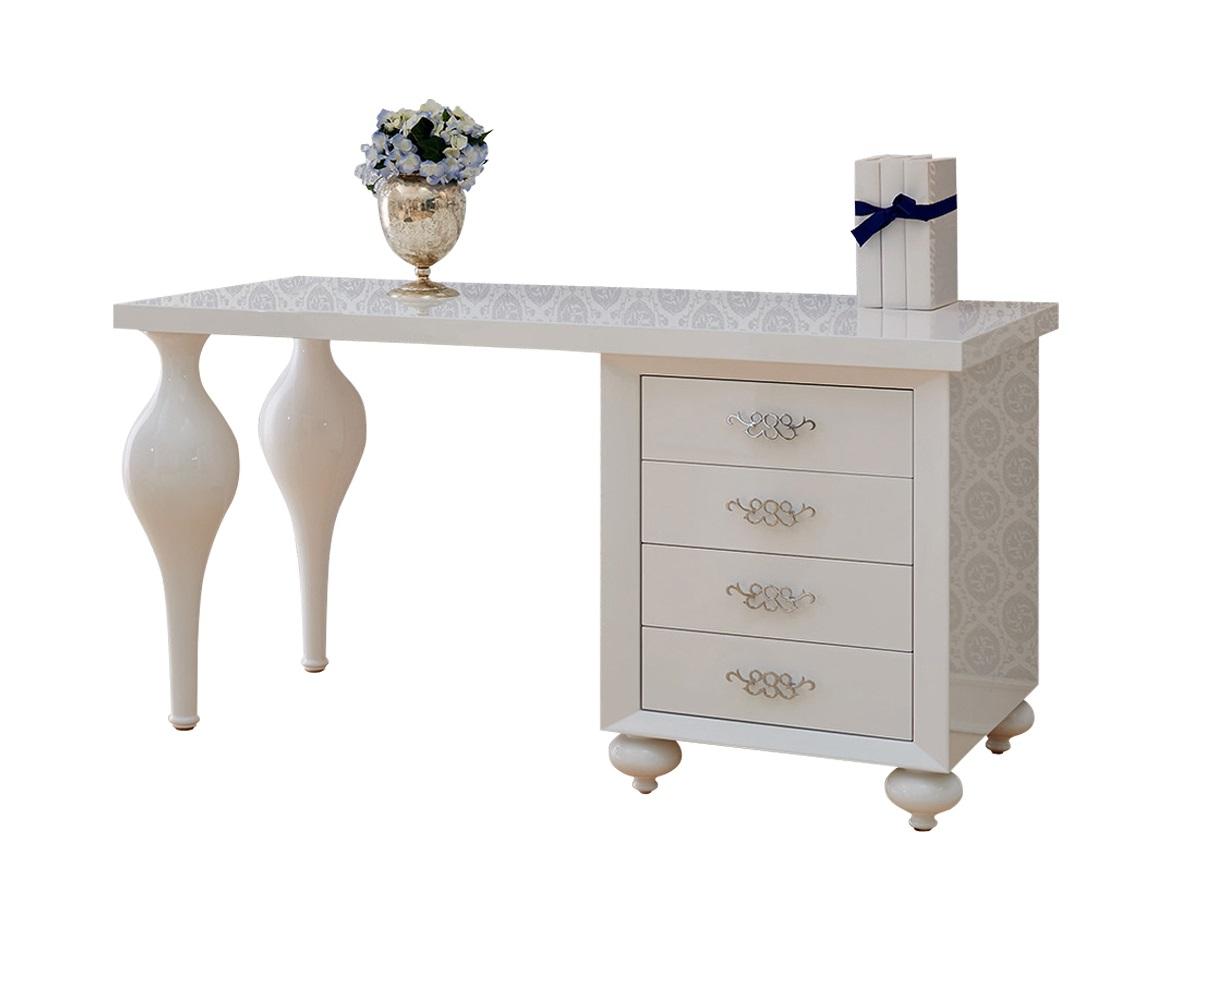 Письменный стол palermo (fratelli barri) белый 150x76x65 см.